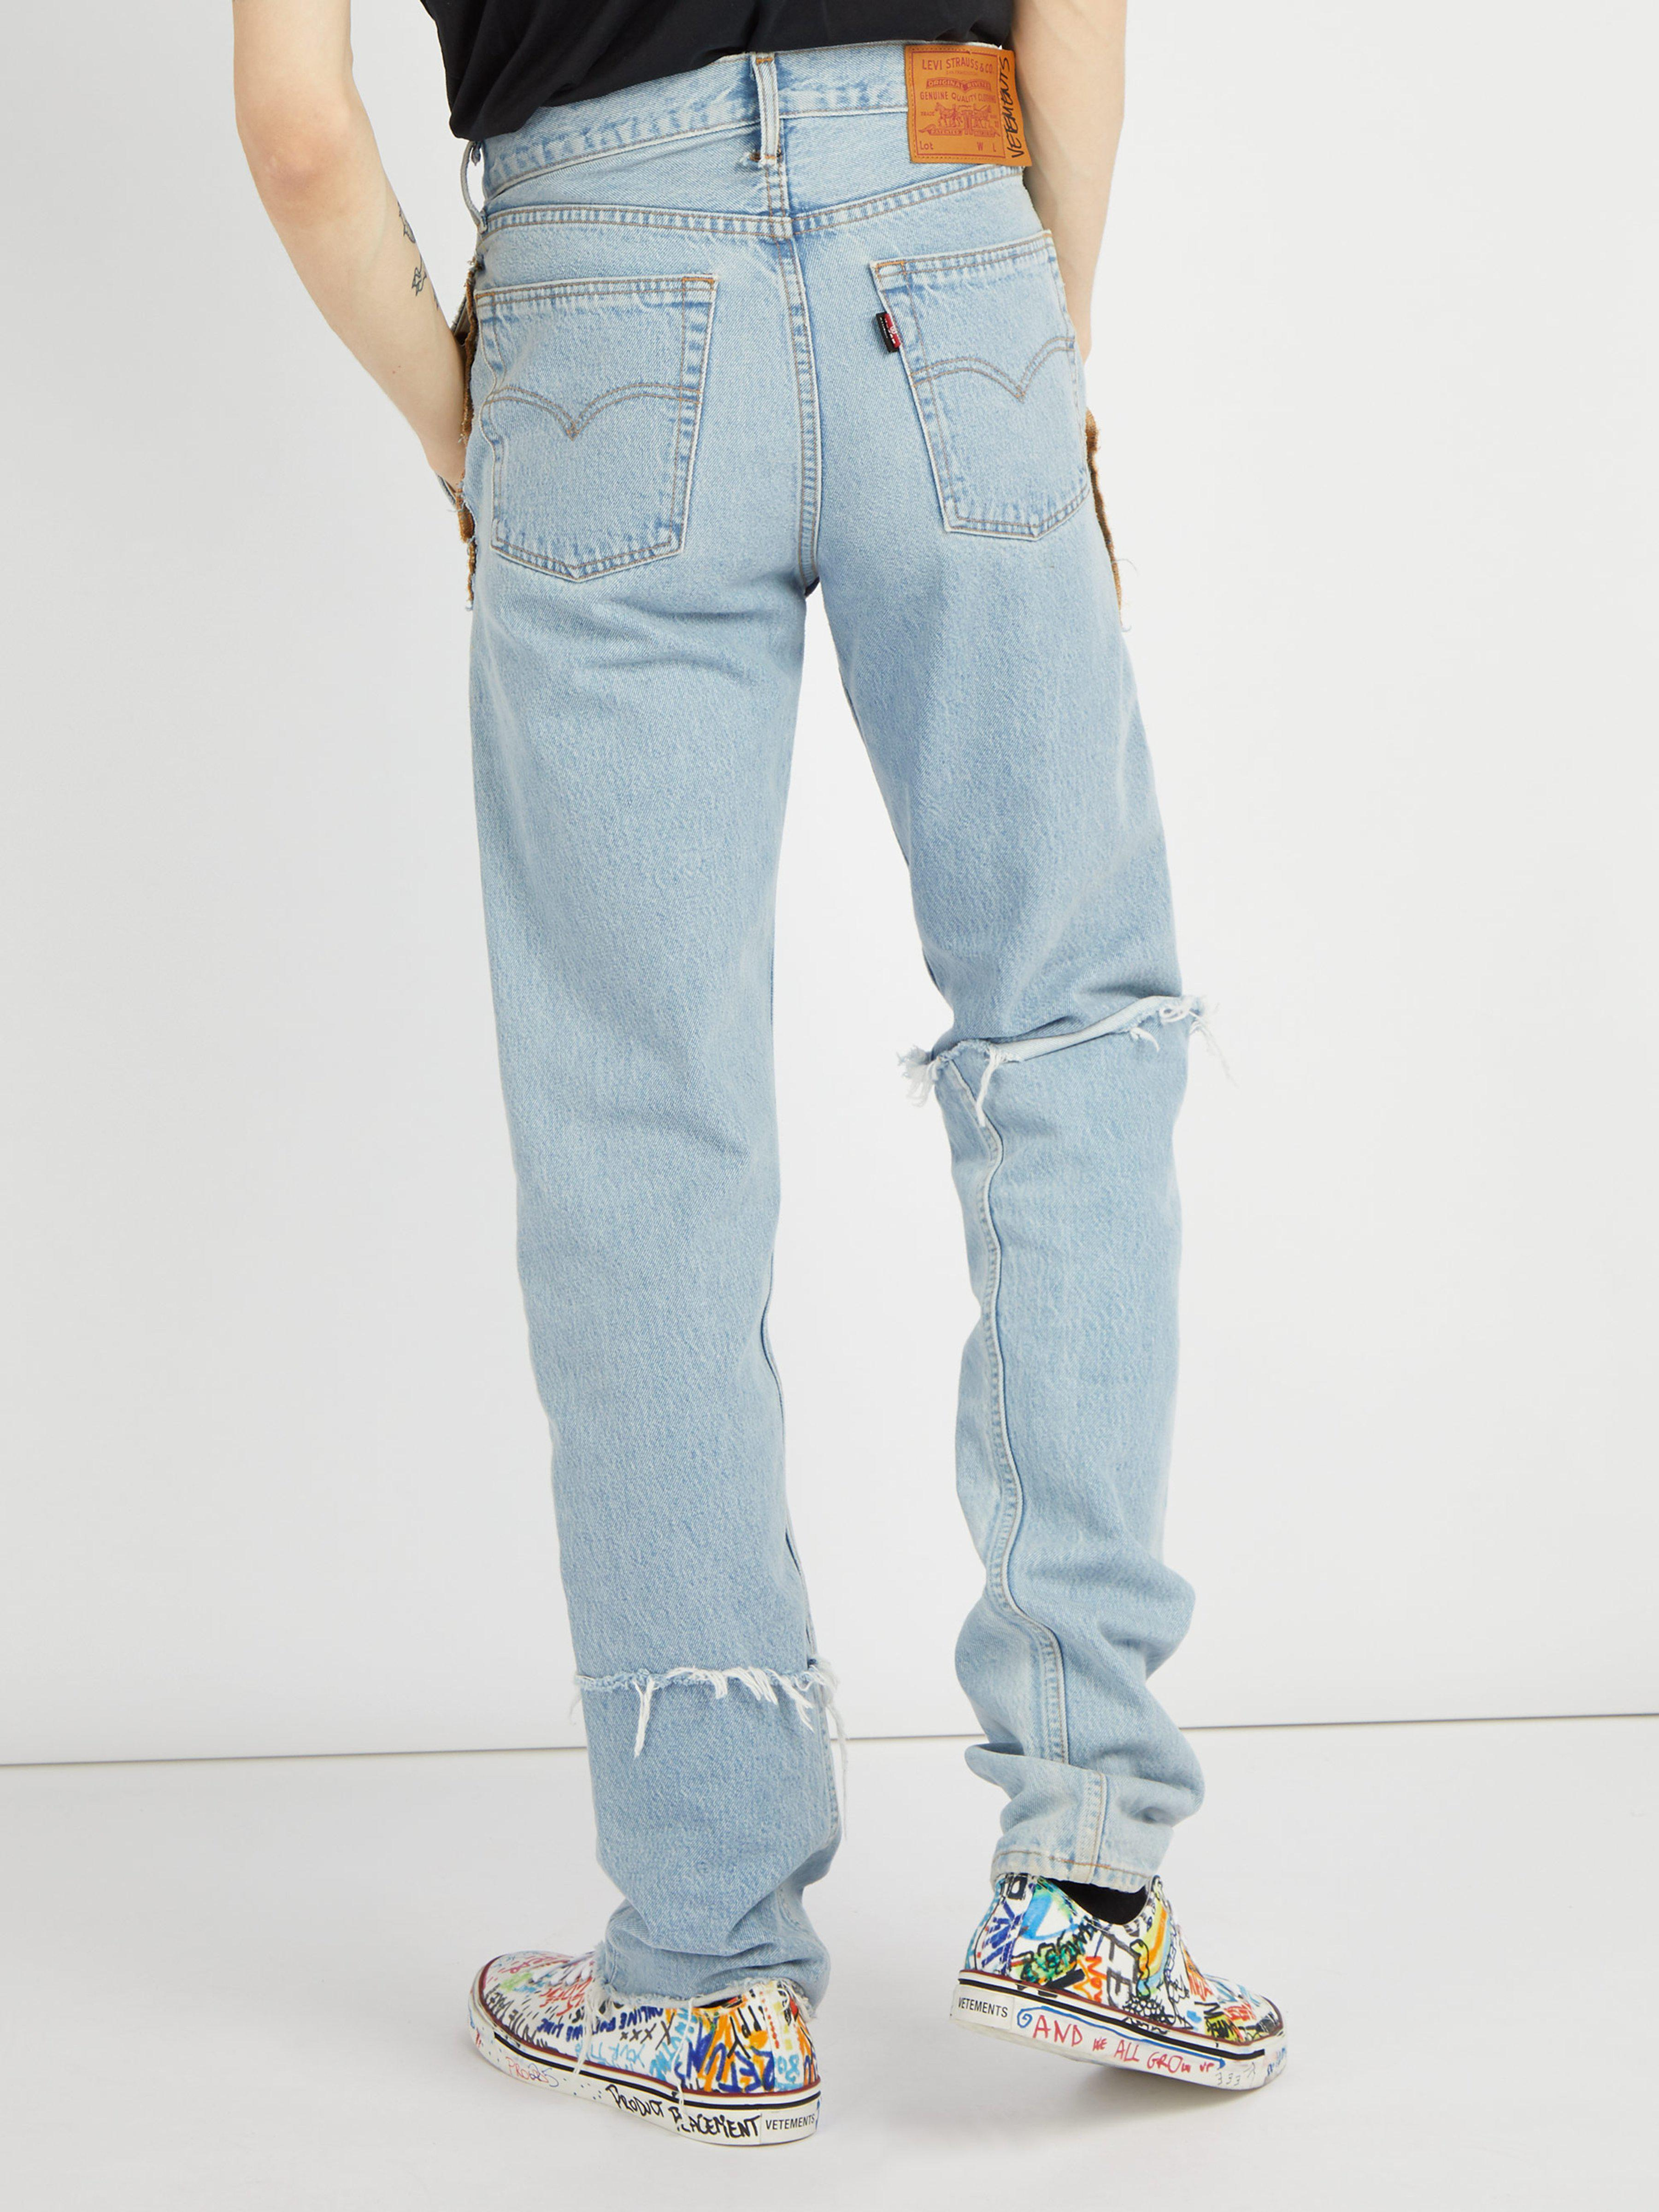 NEW Mens Lanvin Houndstooth Grey Cotton Silk Slim Skinny Jeans GEUINE RRP £615